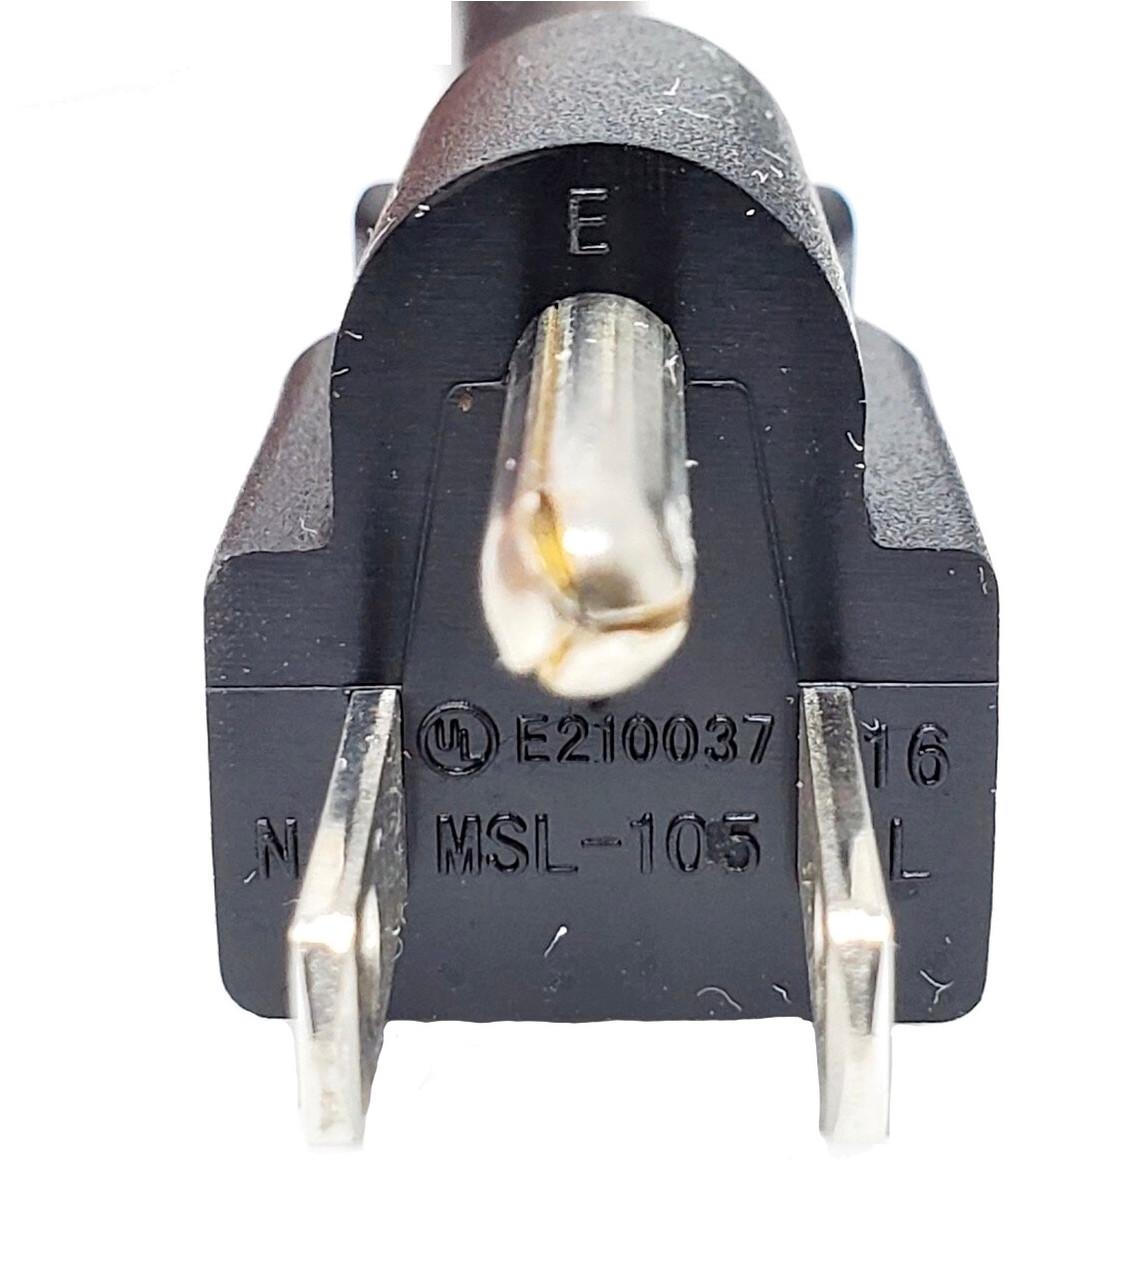 100ft Outdoor Heavy-Duty Power Extension Cable (NEMA 5-15P to NEMA 5-15R)